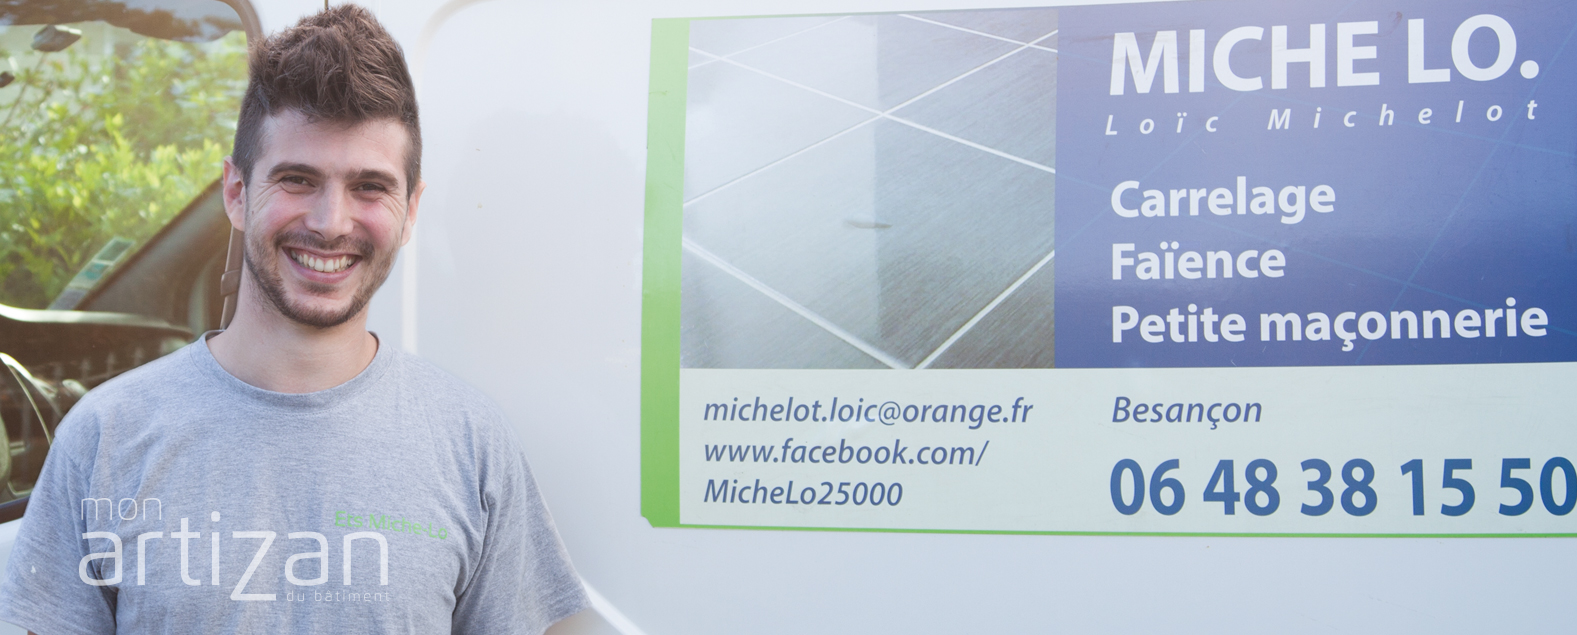 MICHE LO : LA PASSION DU CARRELAGE DE LOÏC MICHELOT.